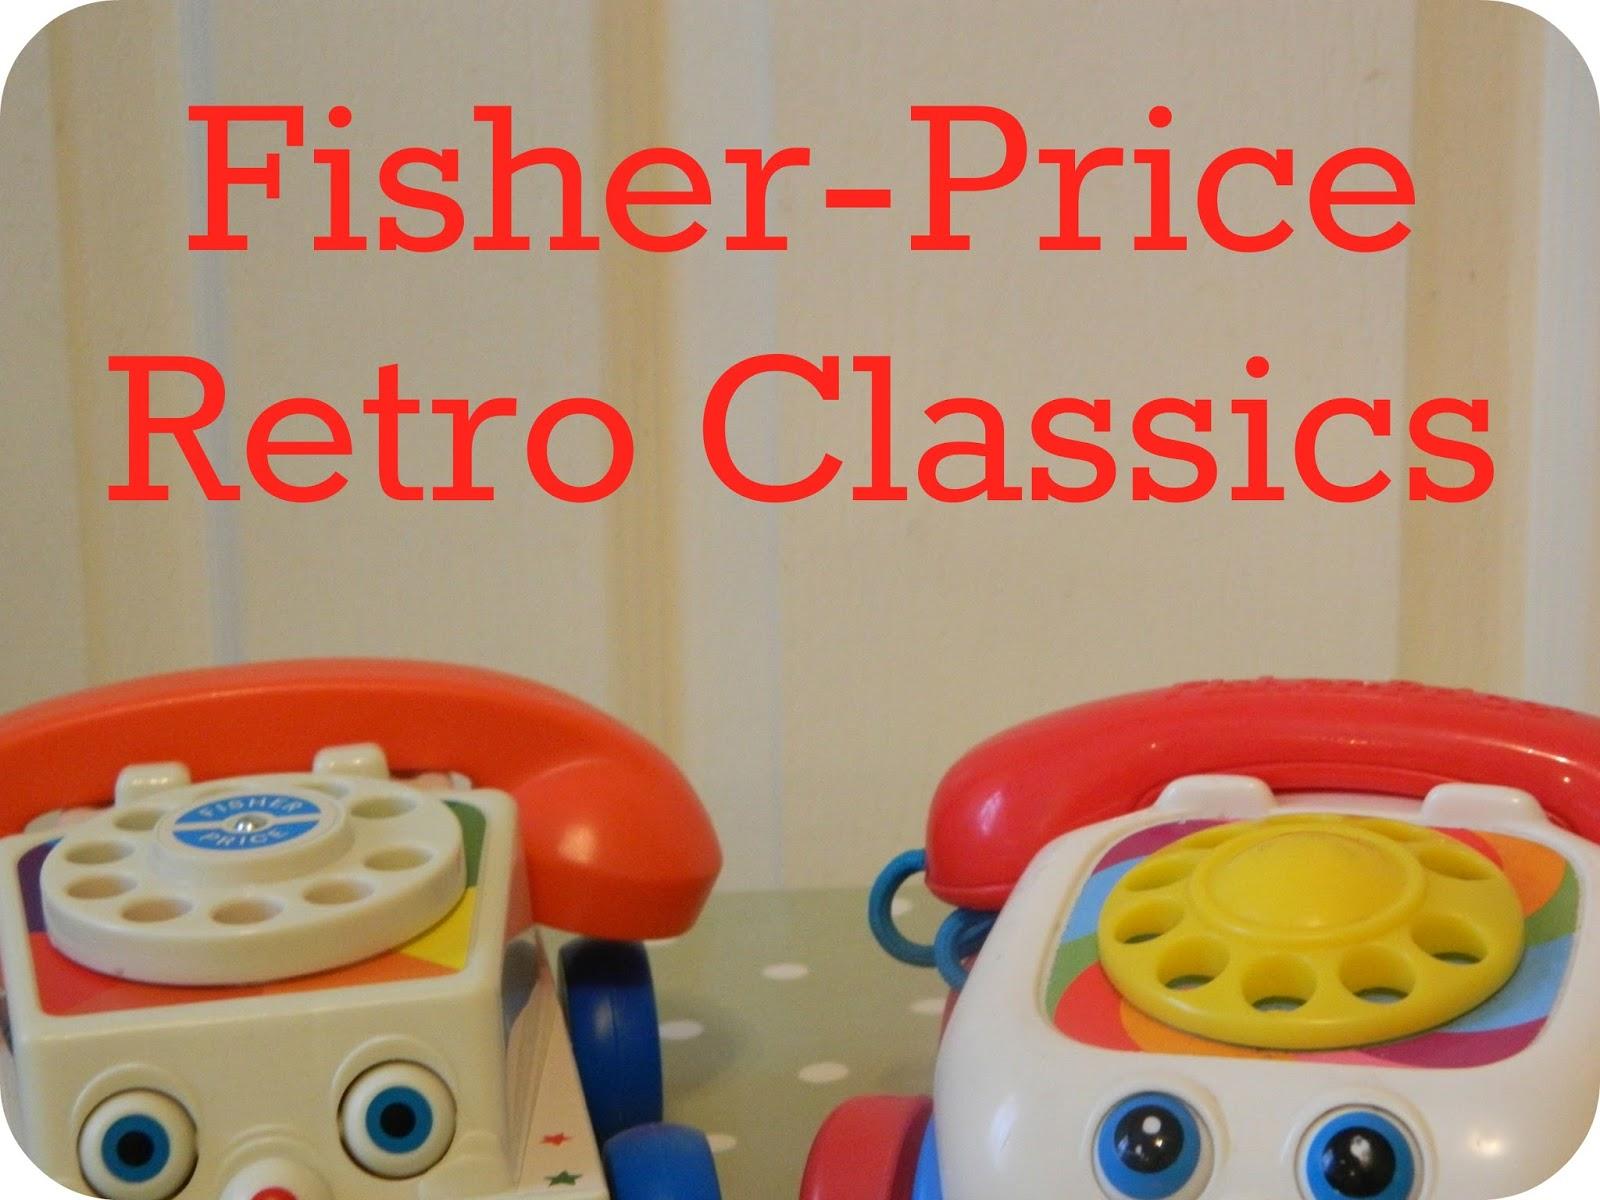 Fisher-Price Retro Classics